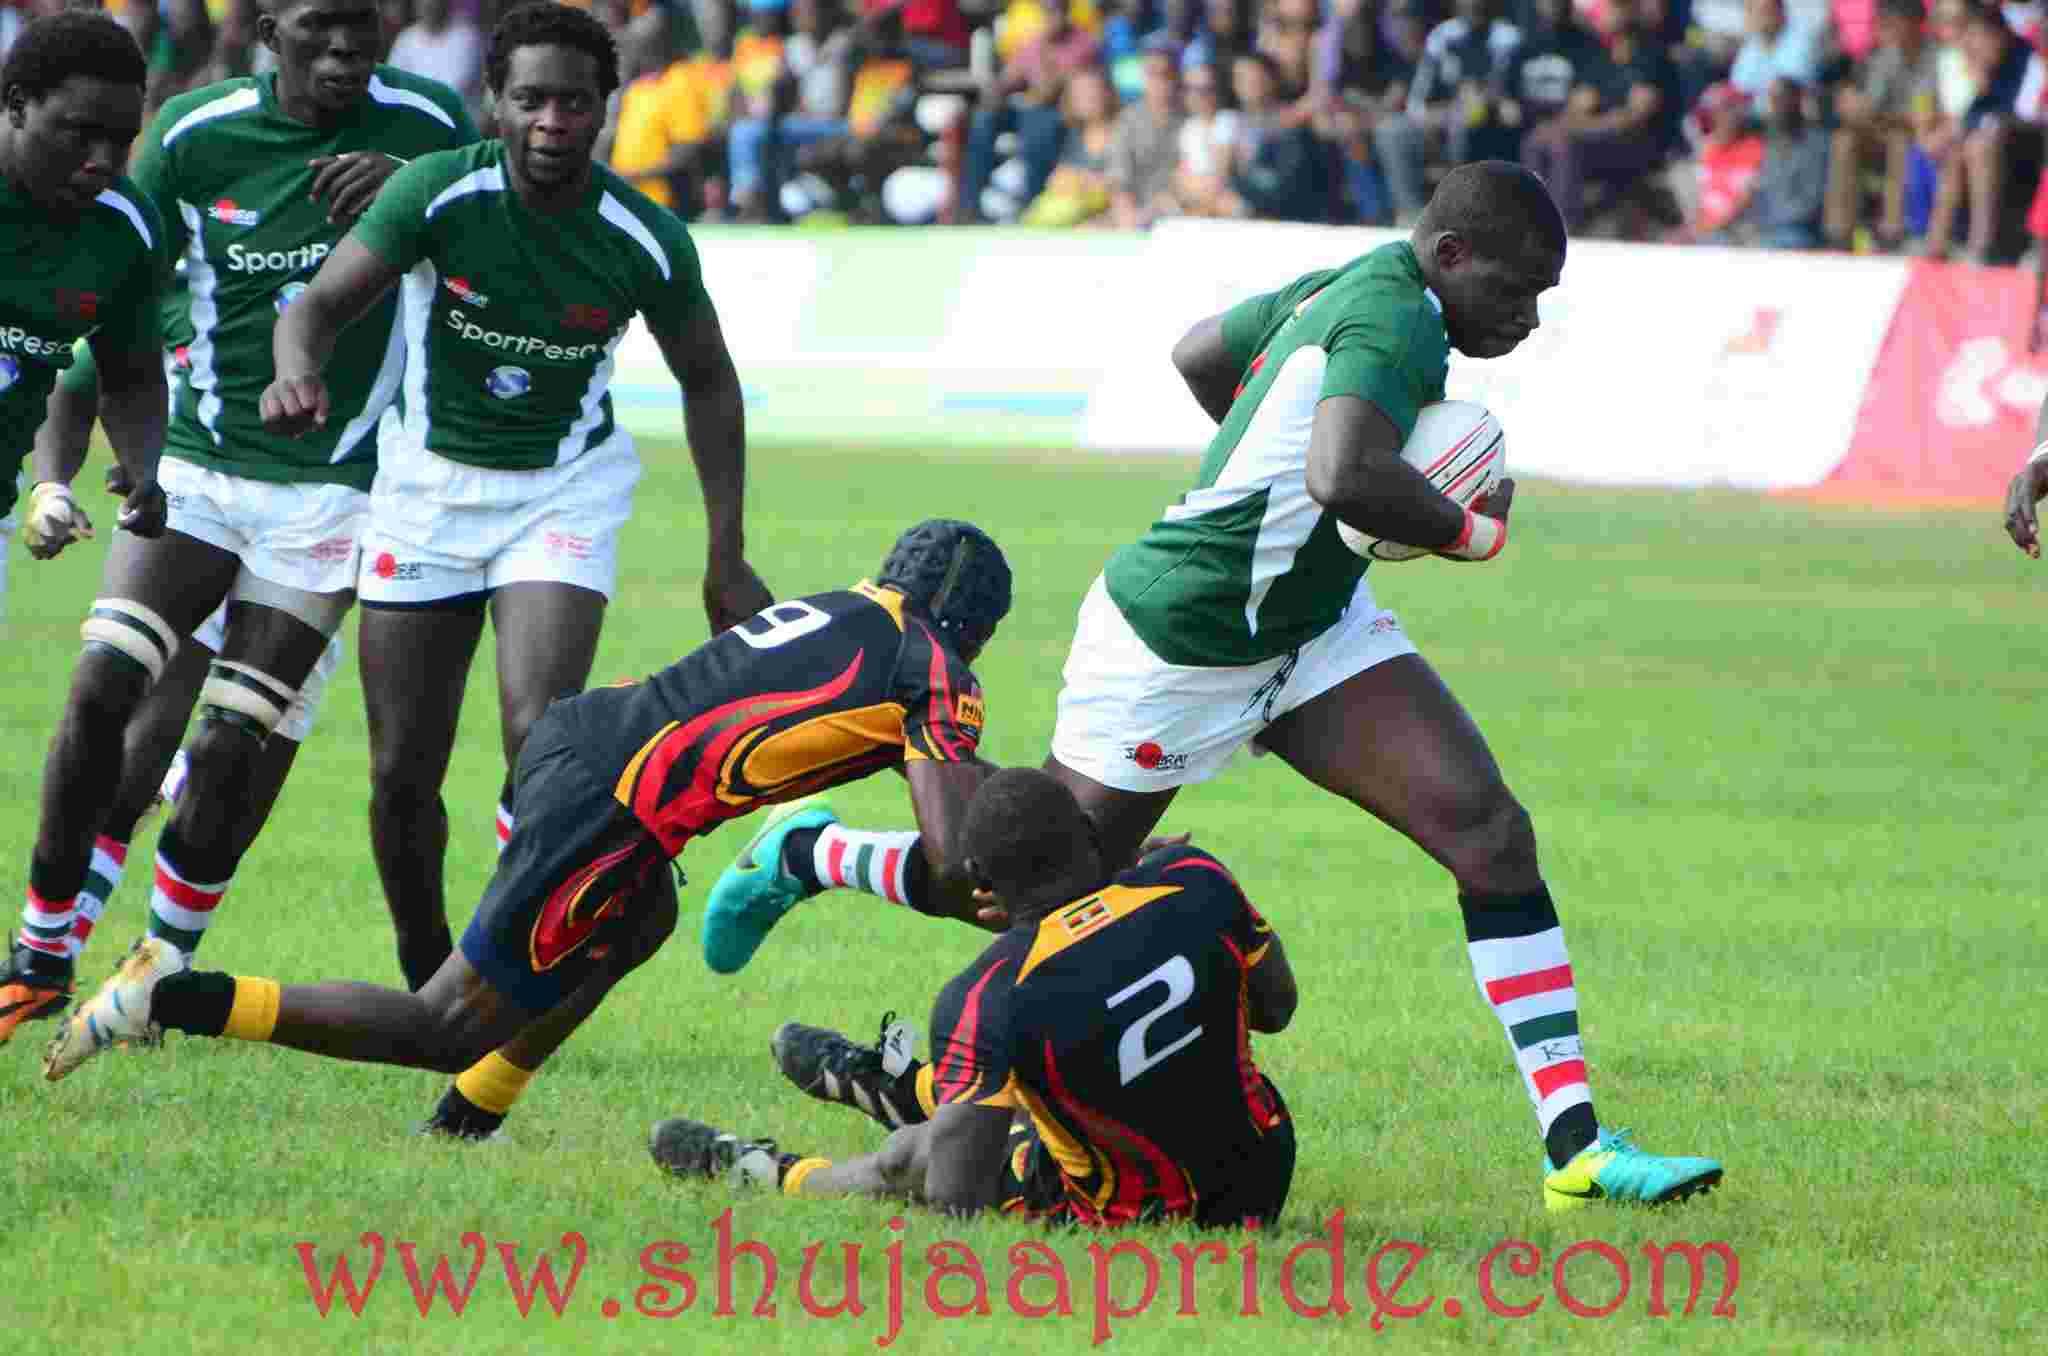 Photos : Kenya vs Uganda | Tries, Penalties and hits